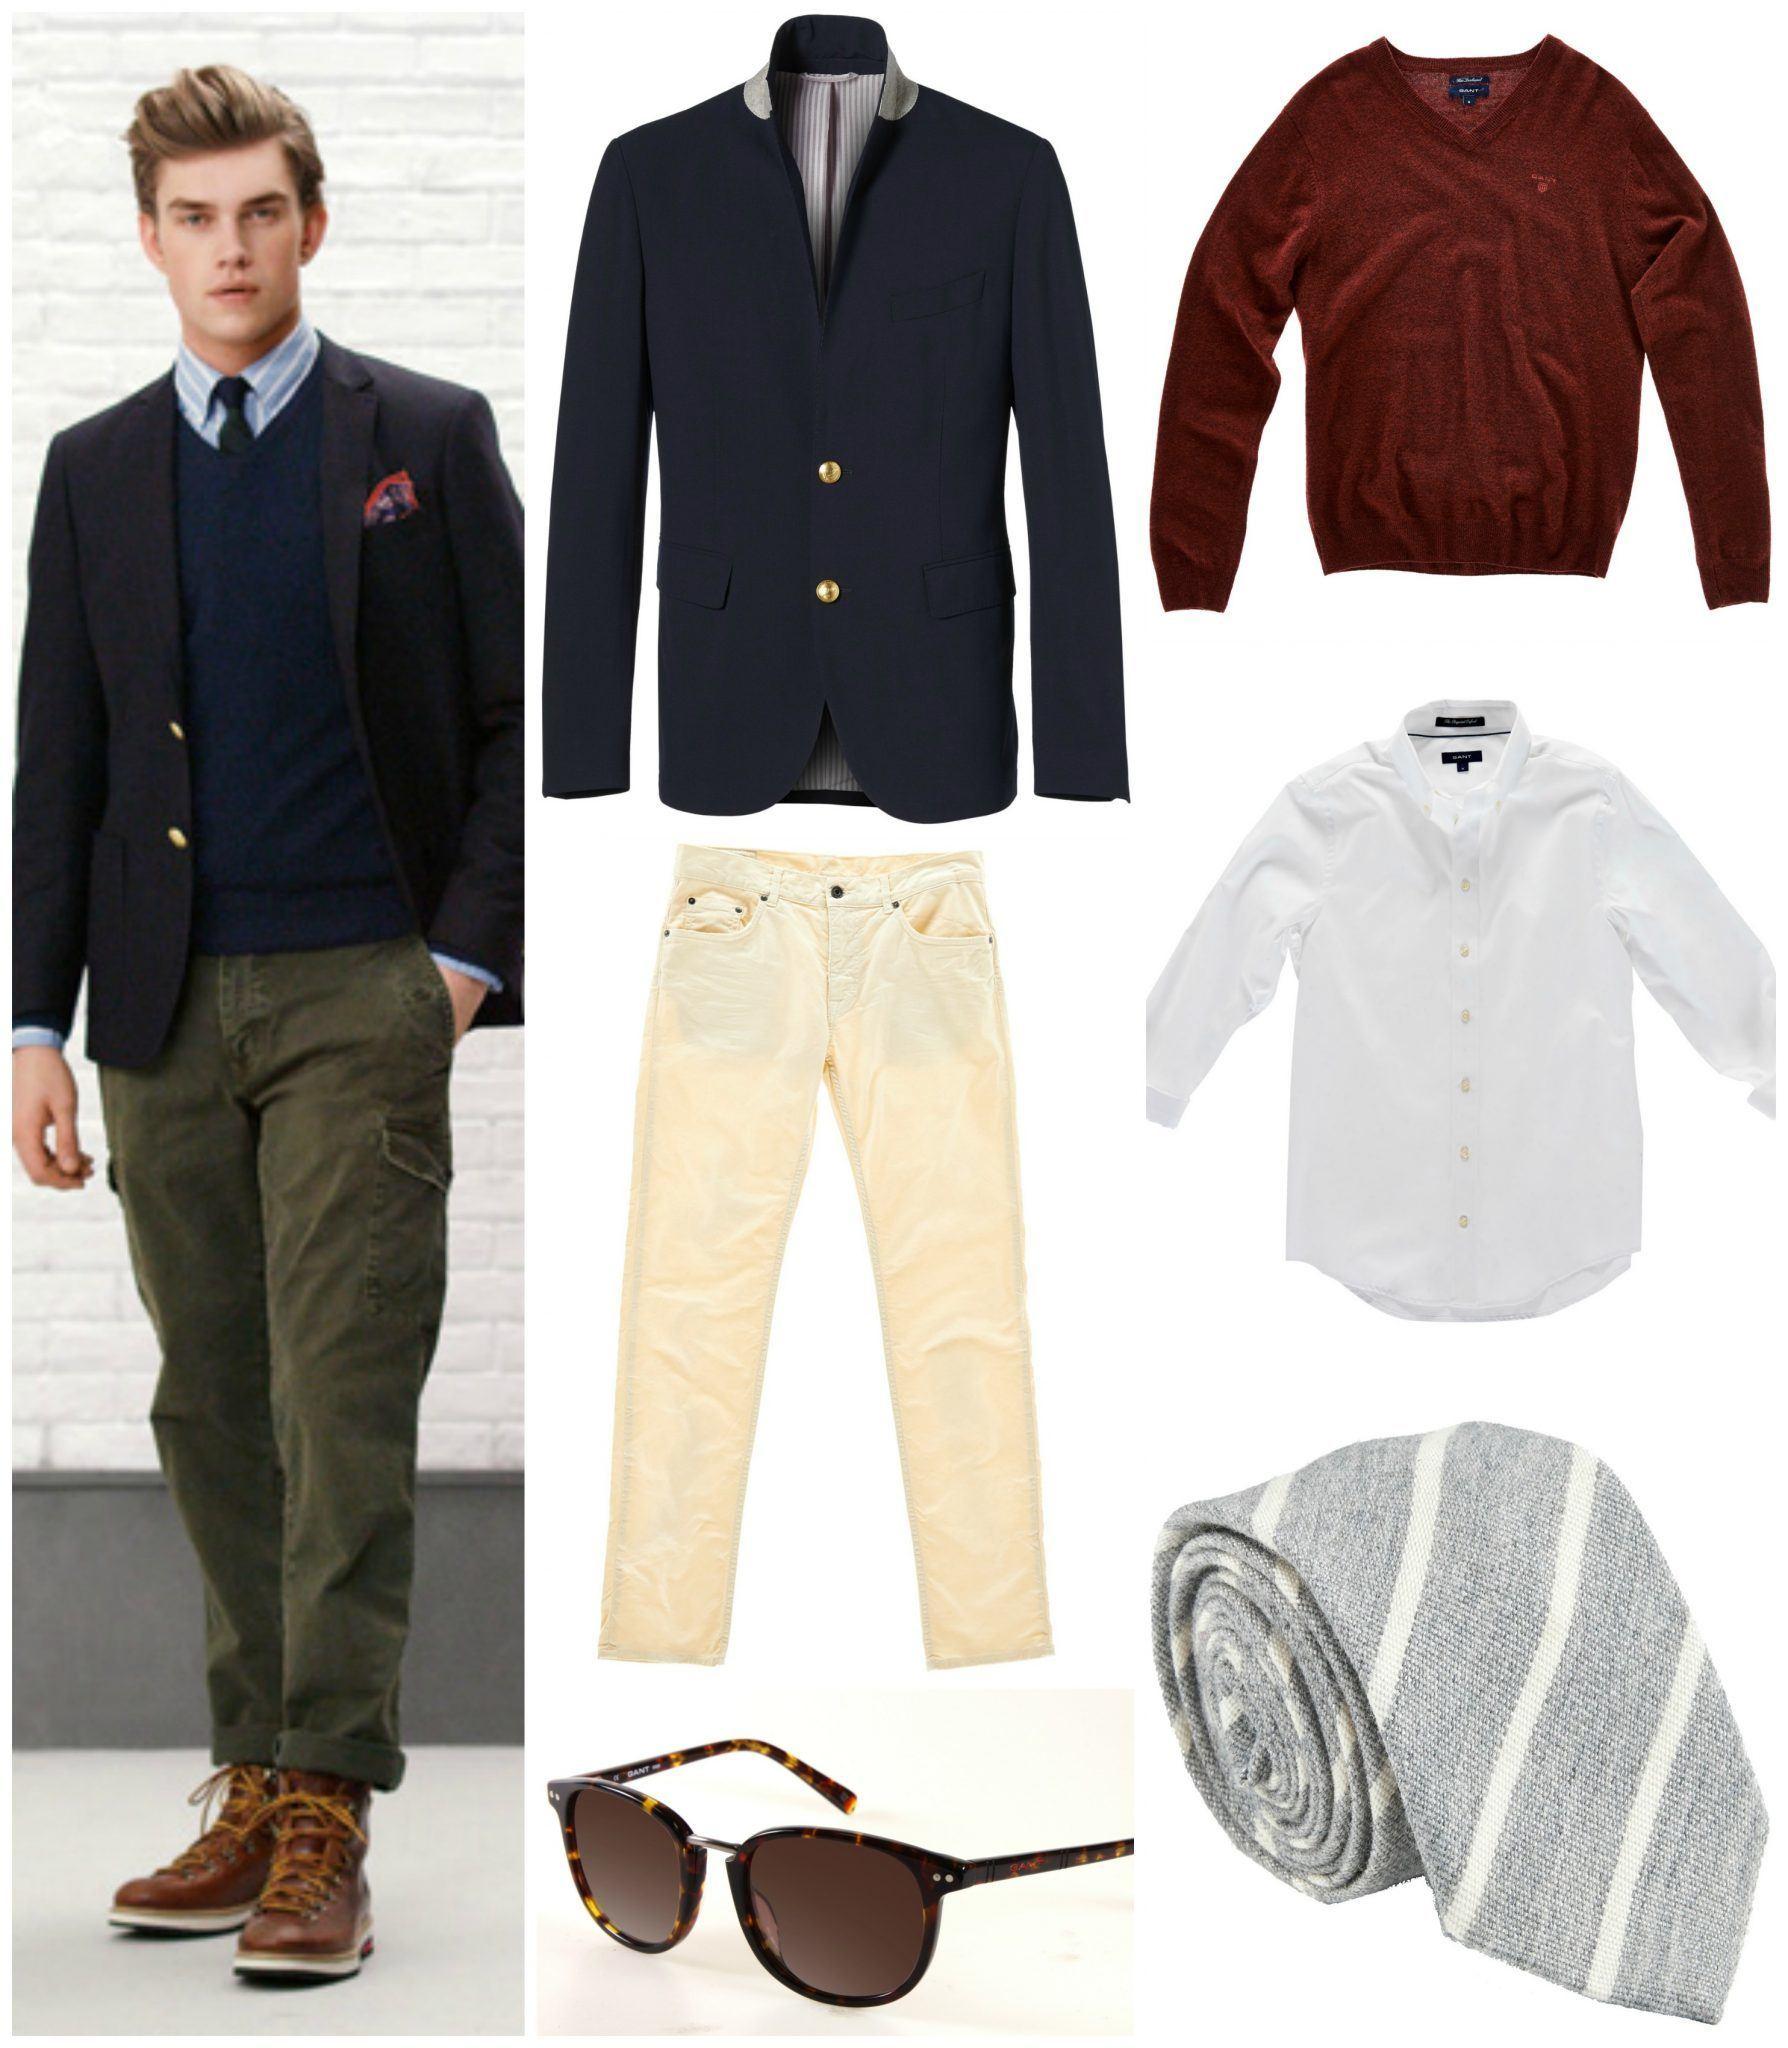 For Men Sweaters For The Fall Season Skimbaco Lifestyle Online Magazine Skimbaco Lifestyle